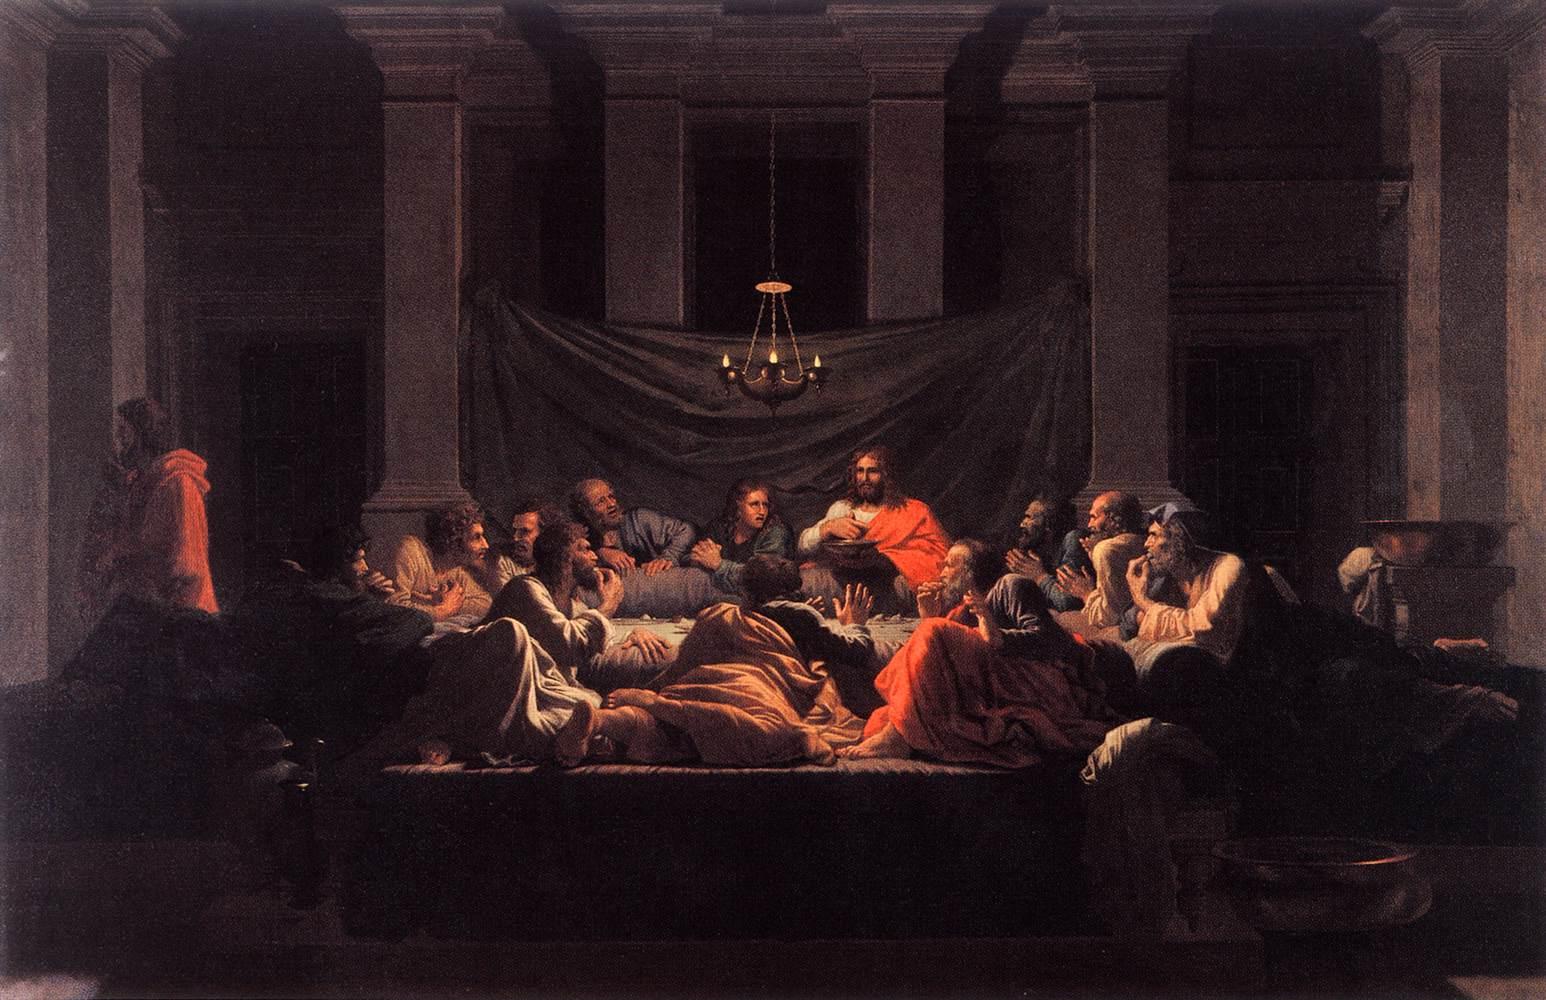 The Eucharist - Poussin 1647